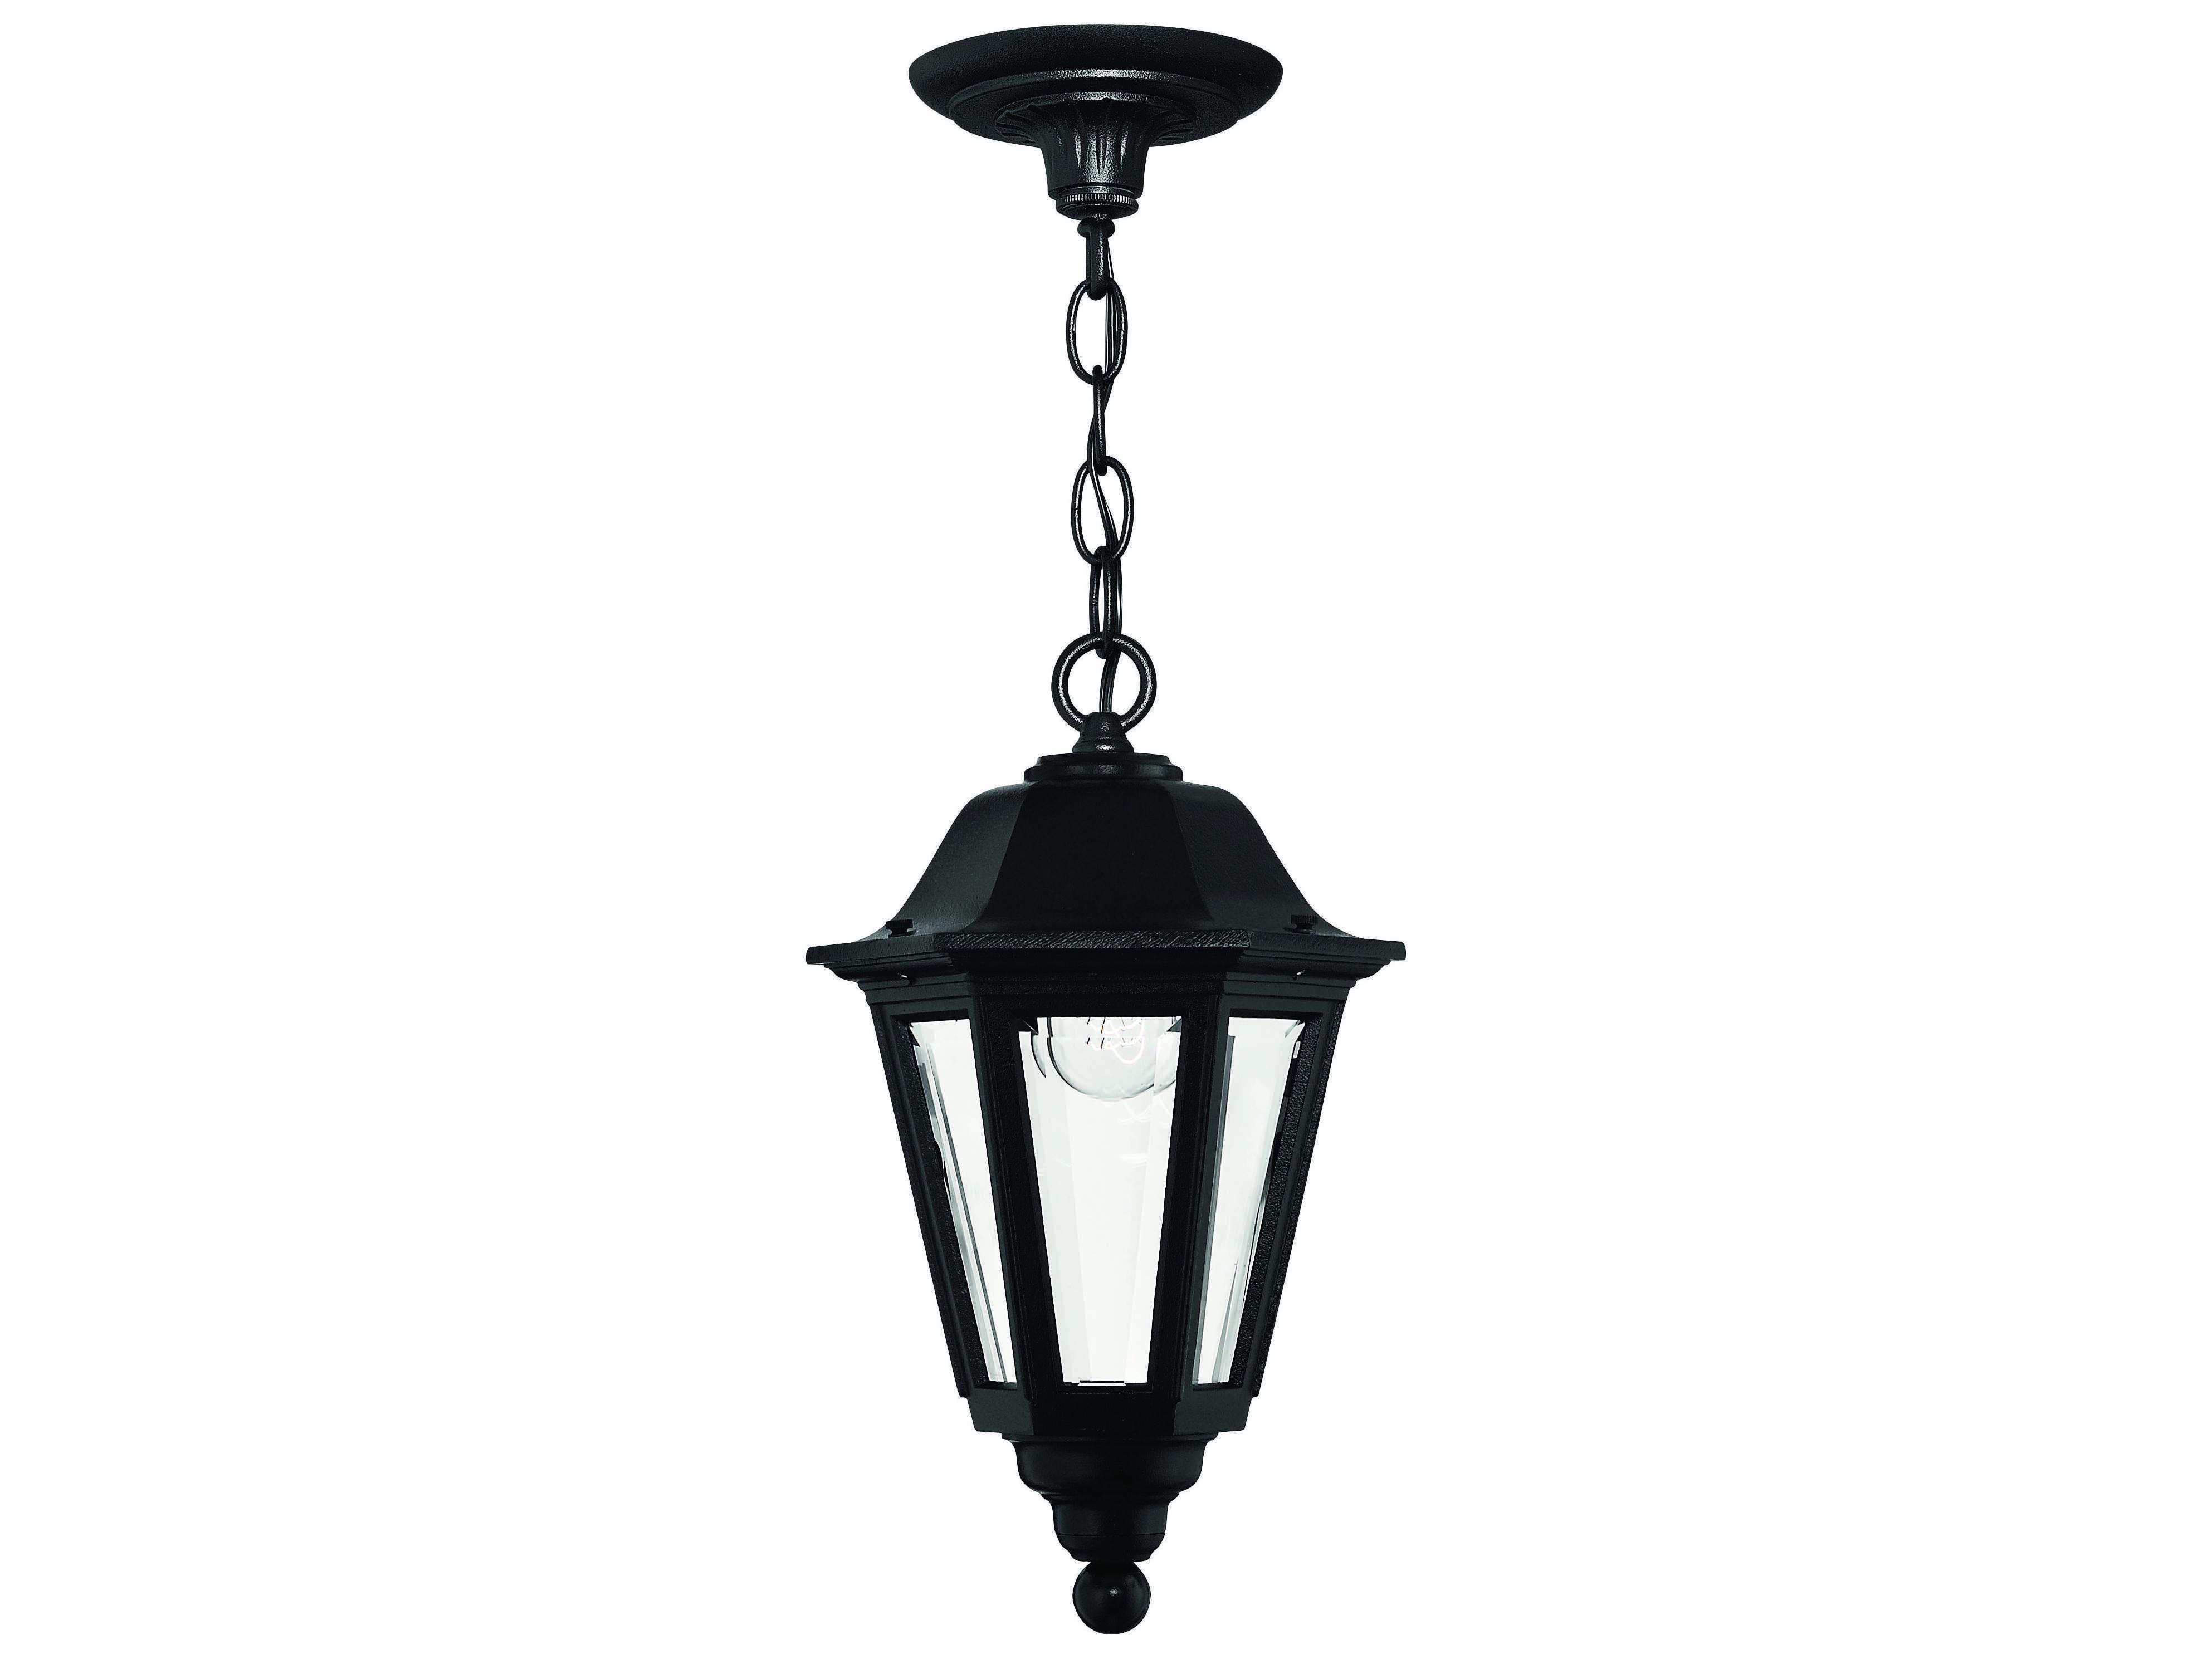 Hinkley Lighting Manor House Black Outdoor Pendant Light